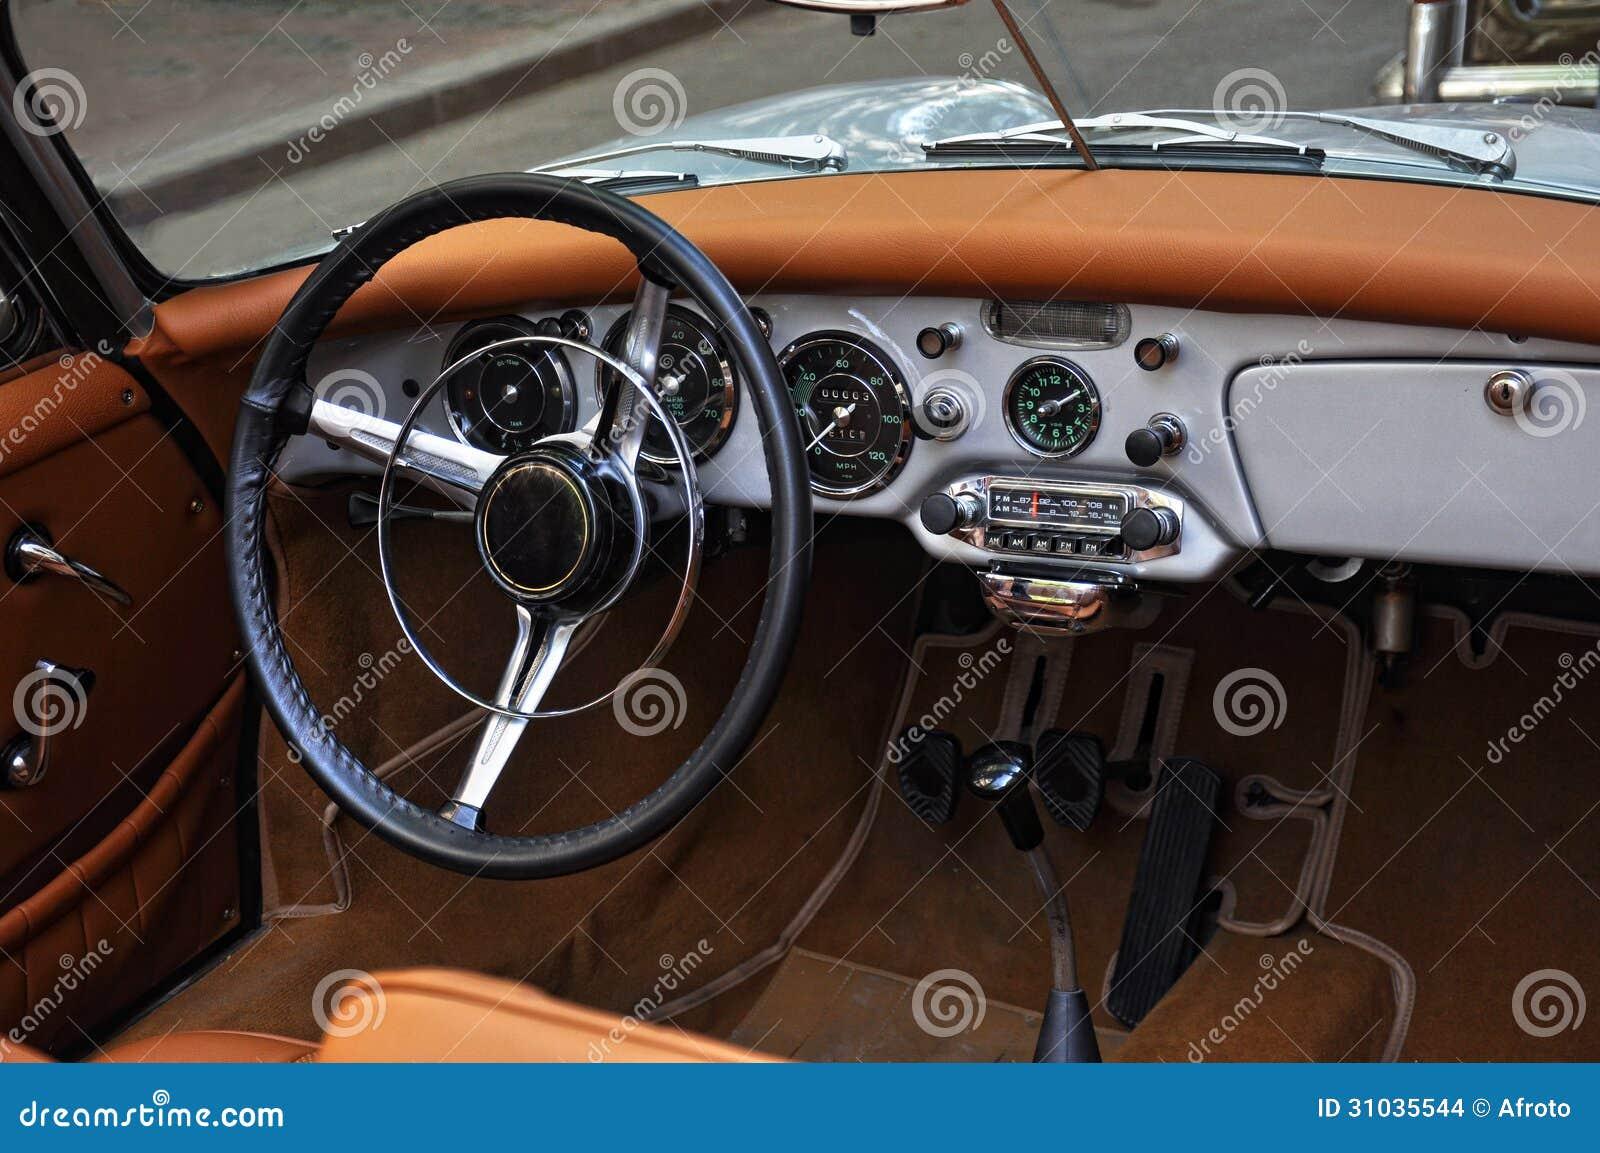 old car interior royalty free stock image 31035544. Black Bedroom Furniture Sets. Home Design Ideas